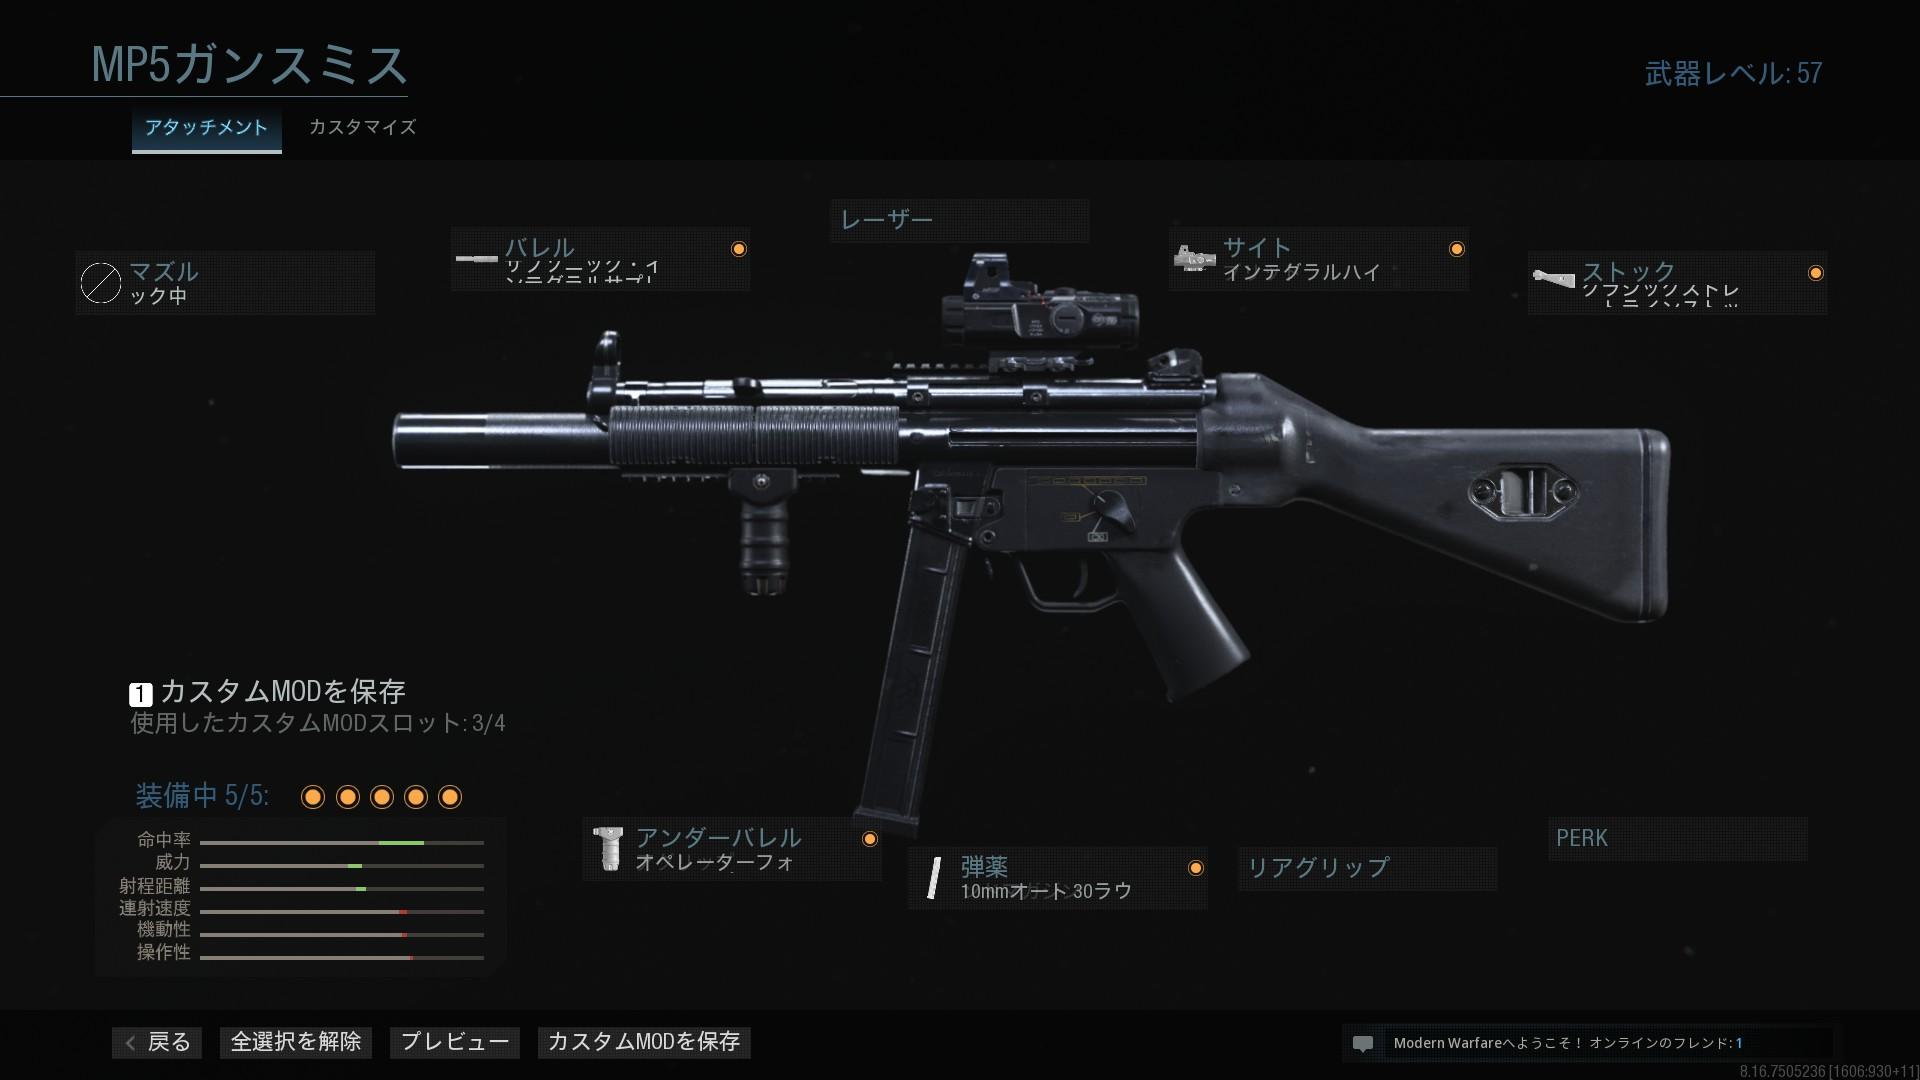 MP5WZ.jpg